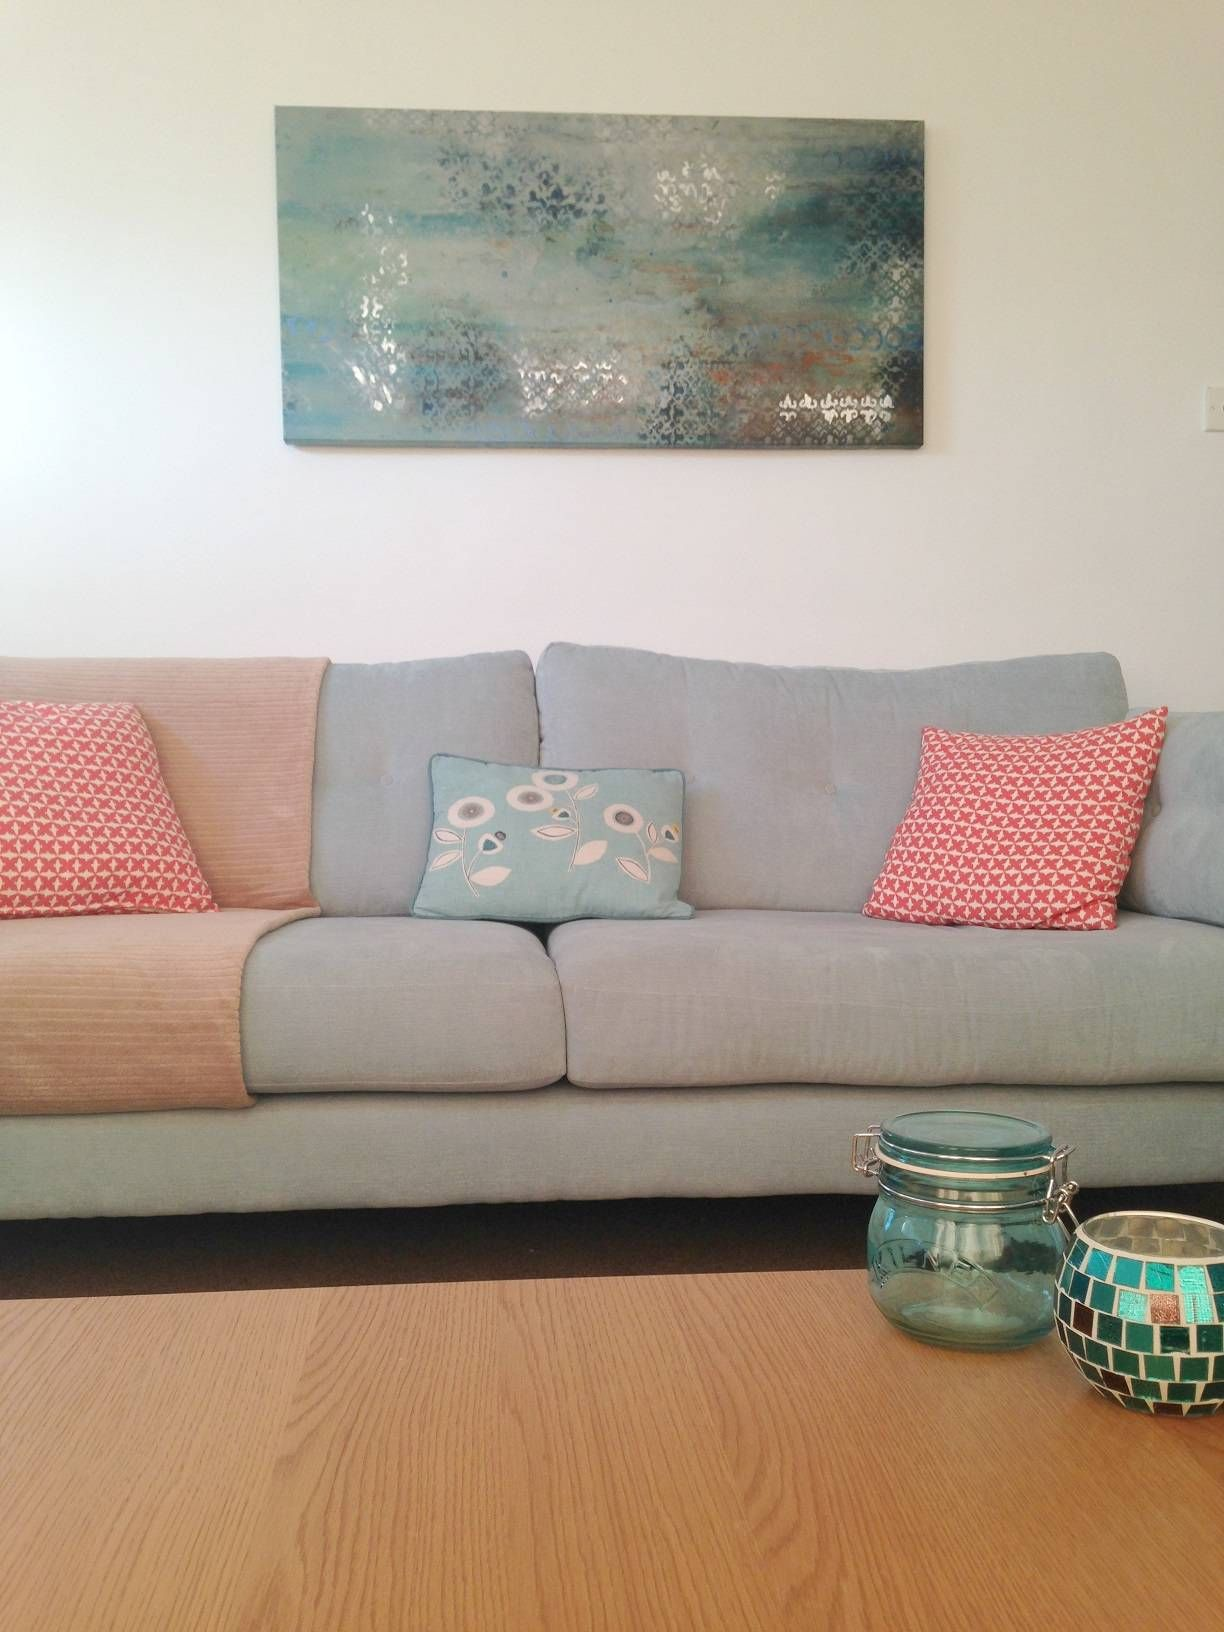 Living Room Home Decor Lovefrommim Lounge Aqua Mint Sofa Homebase Emmett Furniture And C Accessories